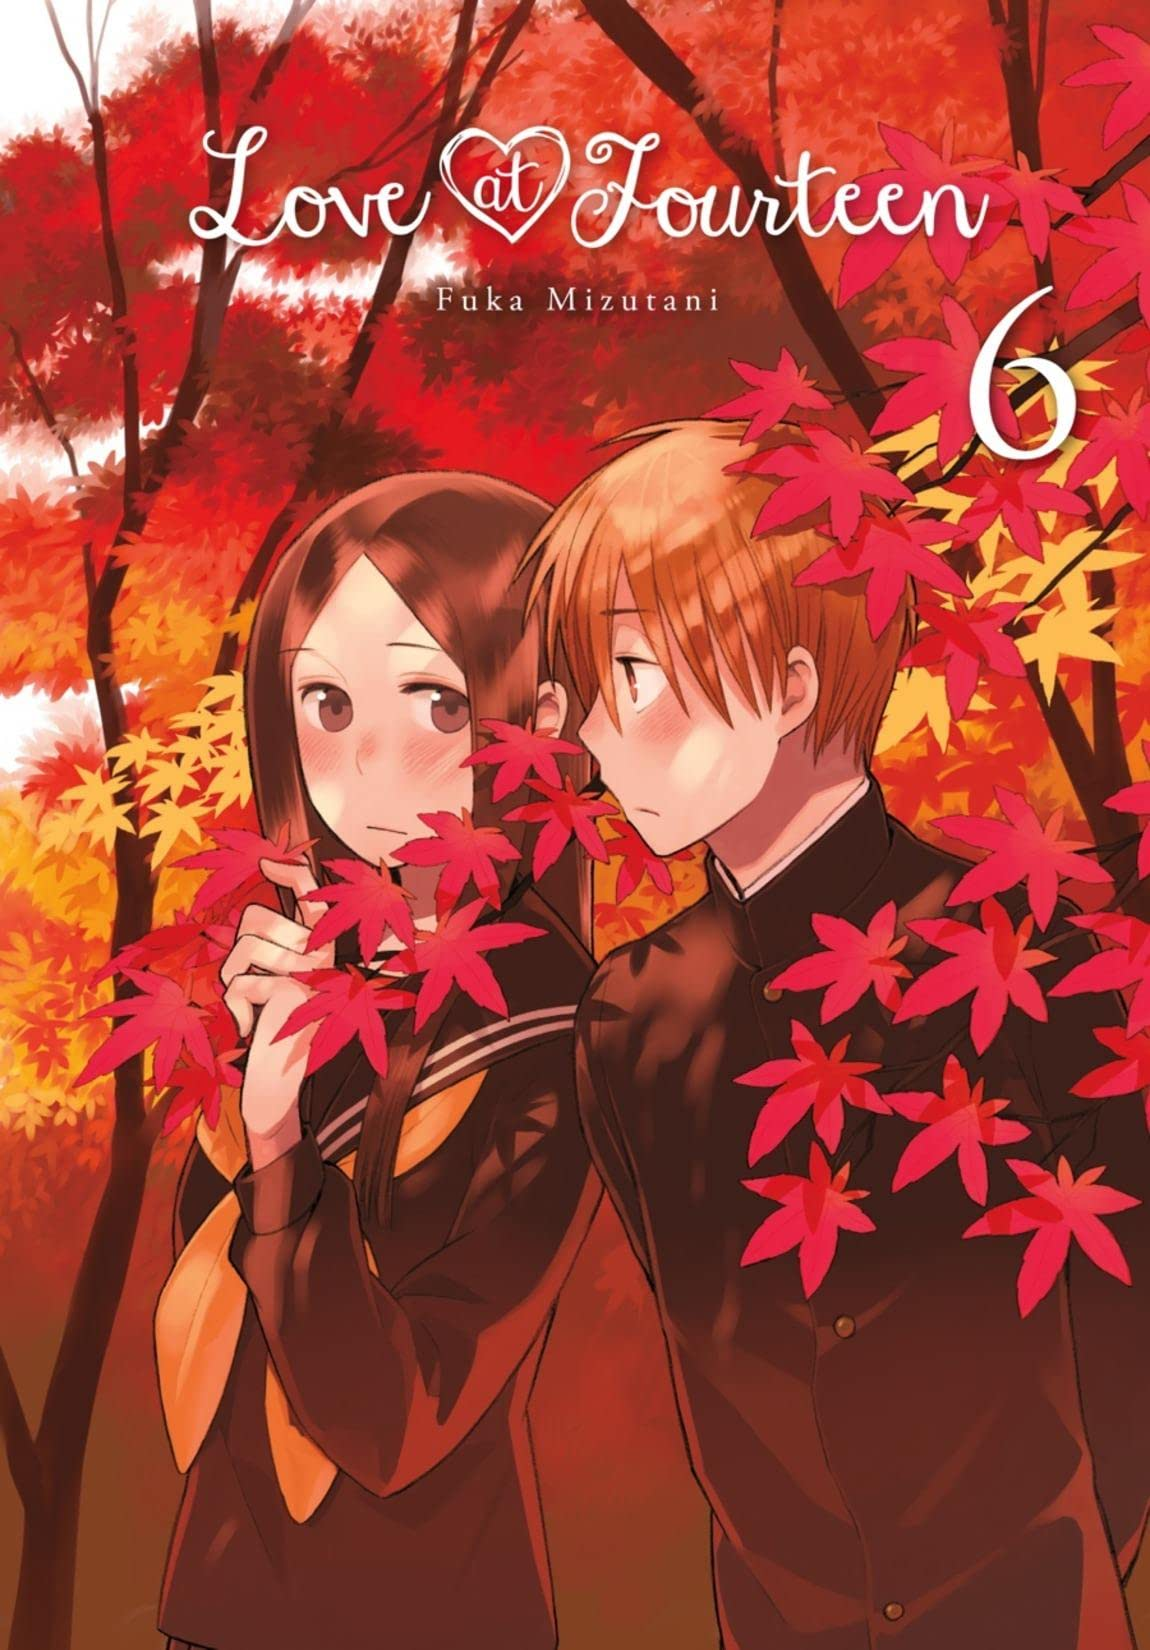 Love at Fourteen Vol. 6